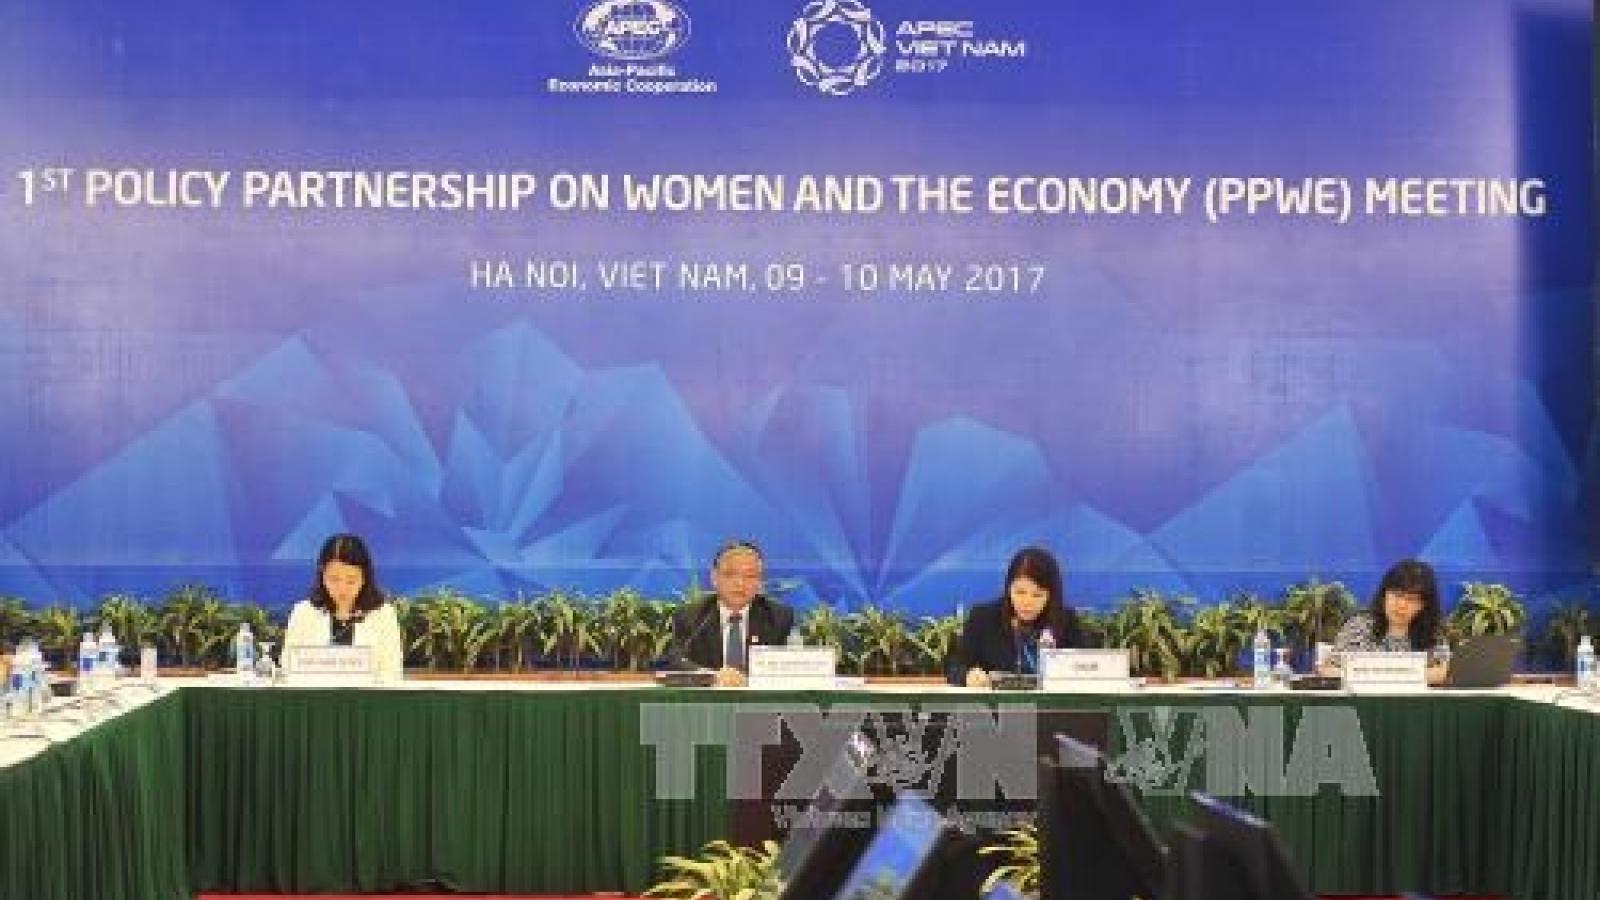 APEC meeting discusses women's role in economy